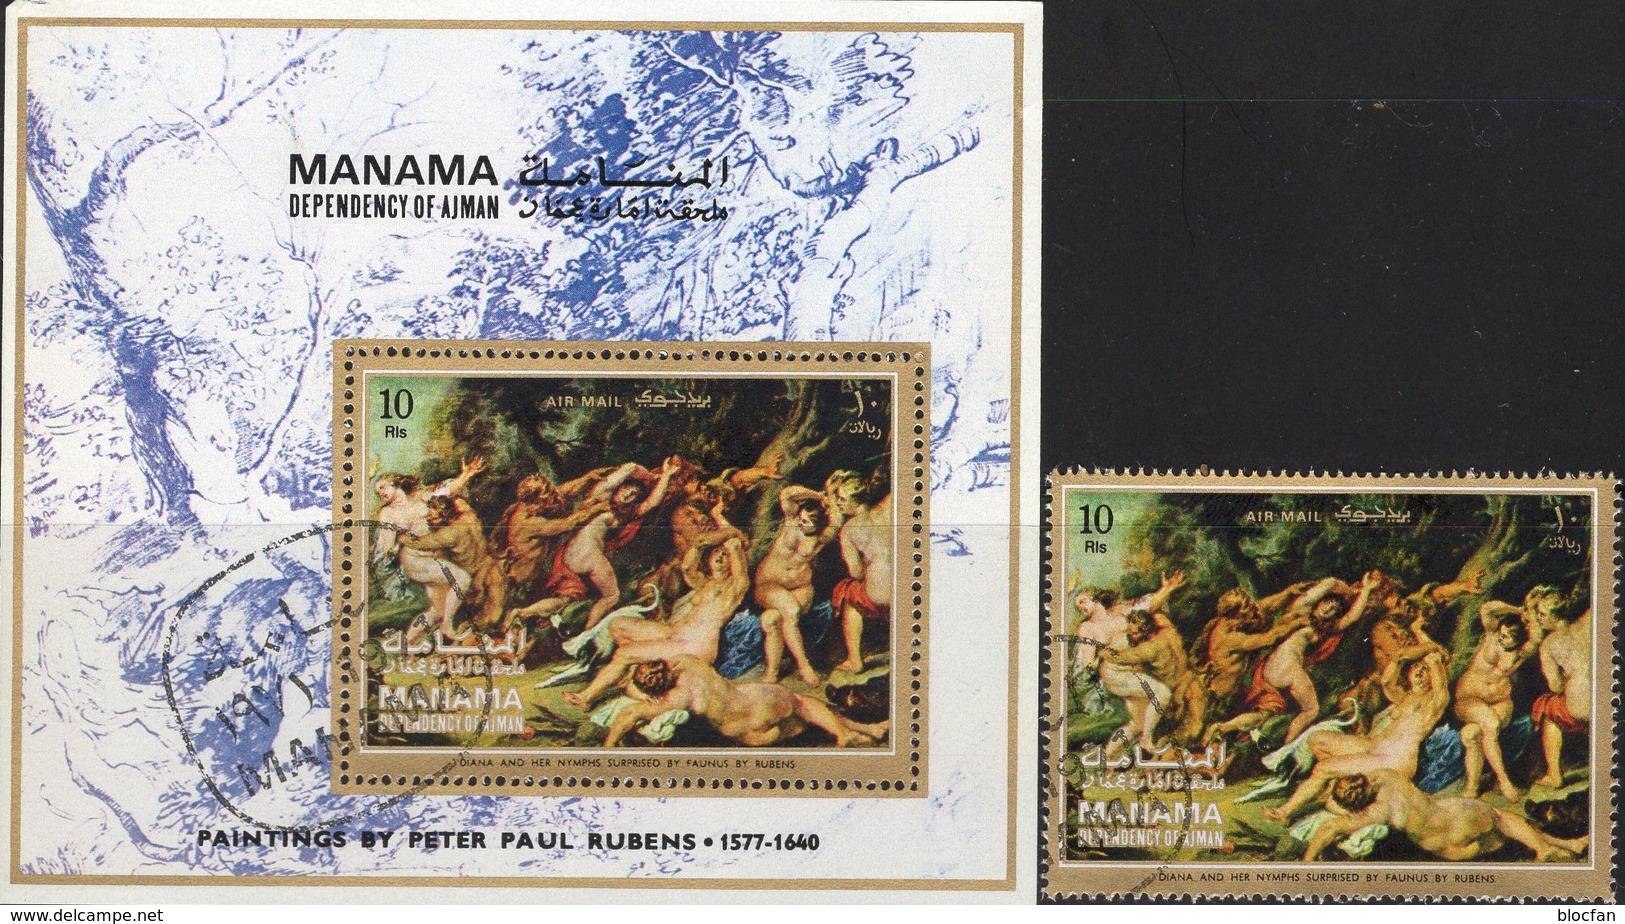 Maler Rubens Gemälde 1971 Manama 455+Block 100 O 3€ Diana Und Nymphen Art Bloc Paintings S/s Art Sheet VAE Adschman - Paintings